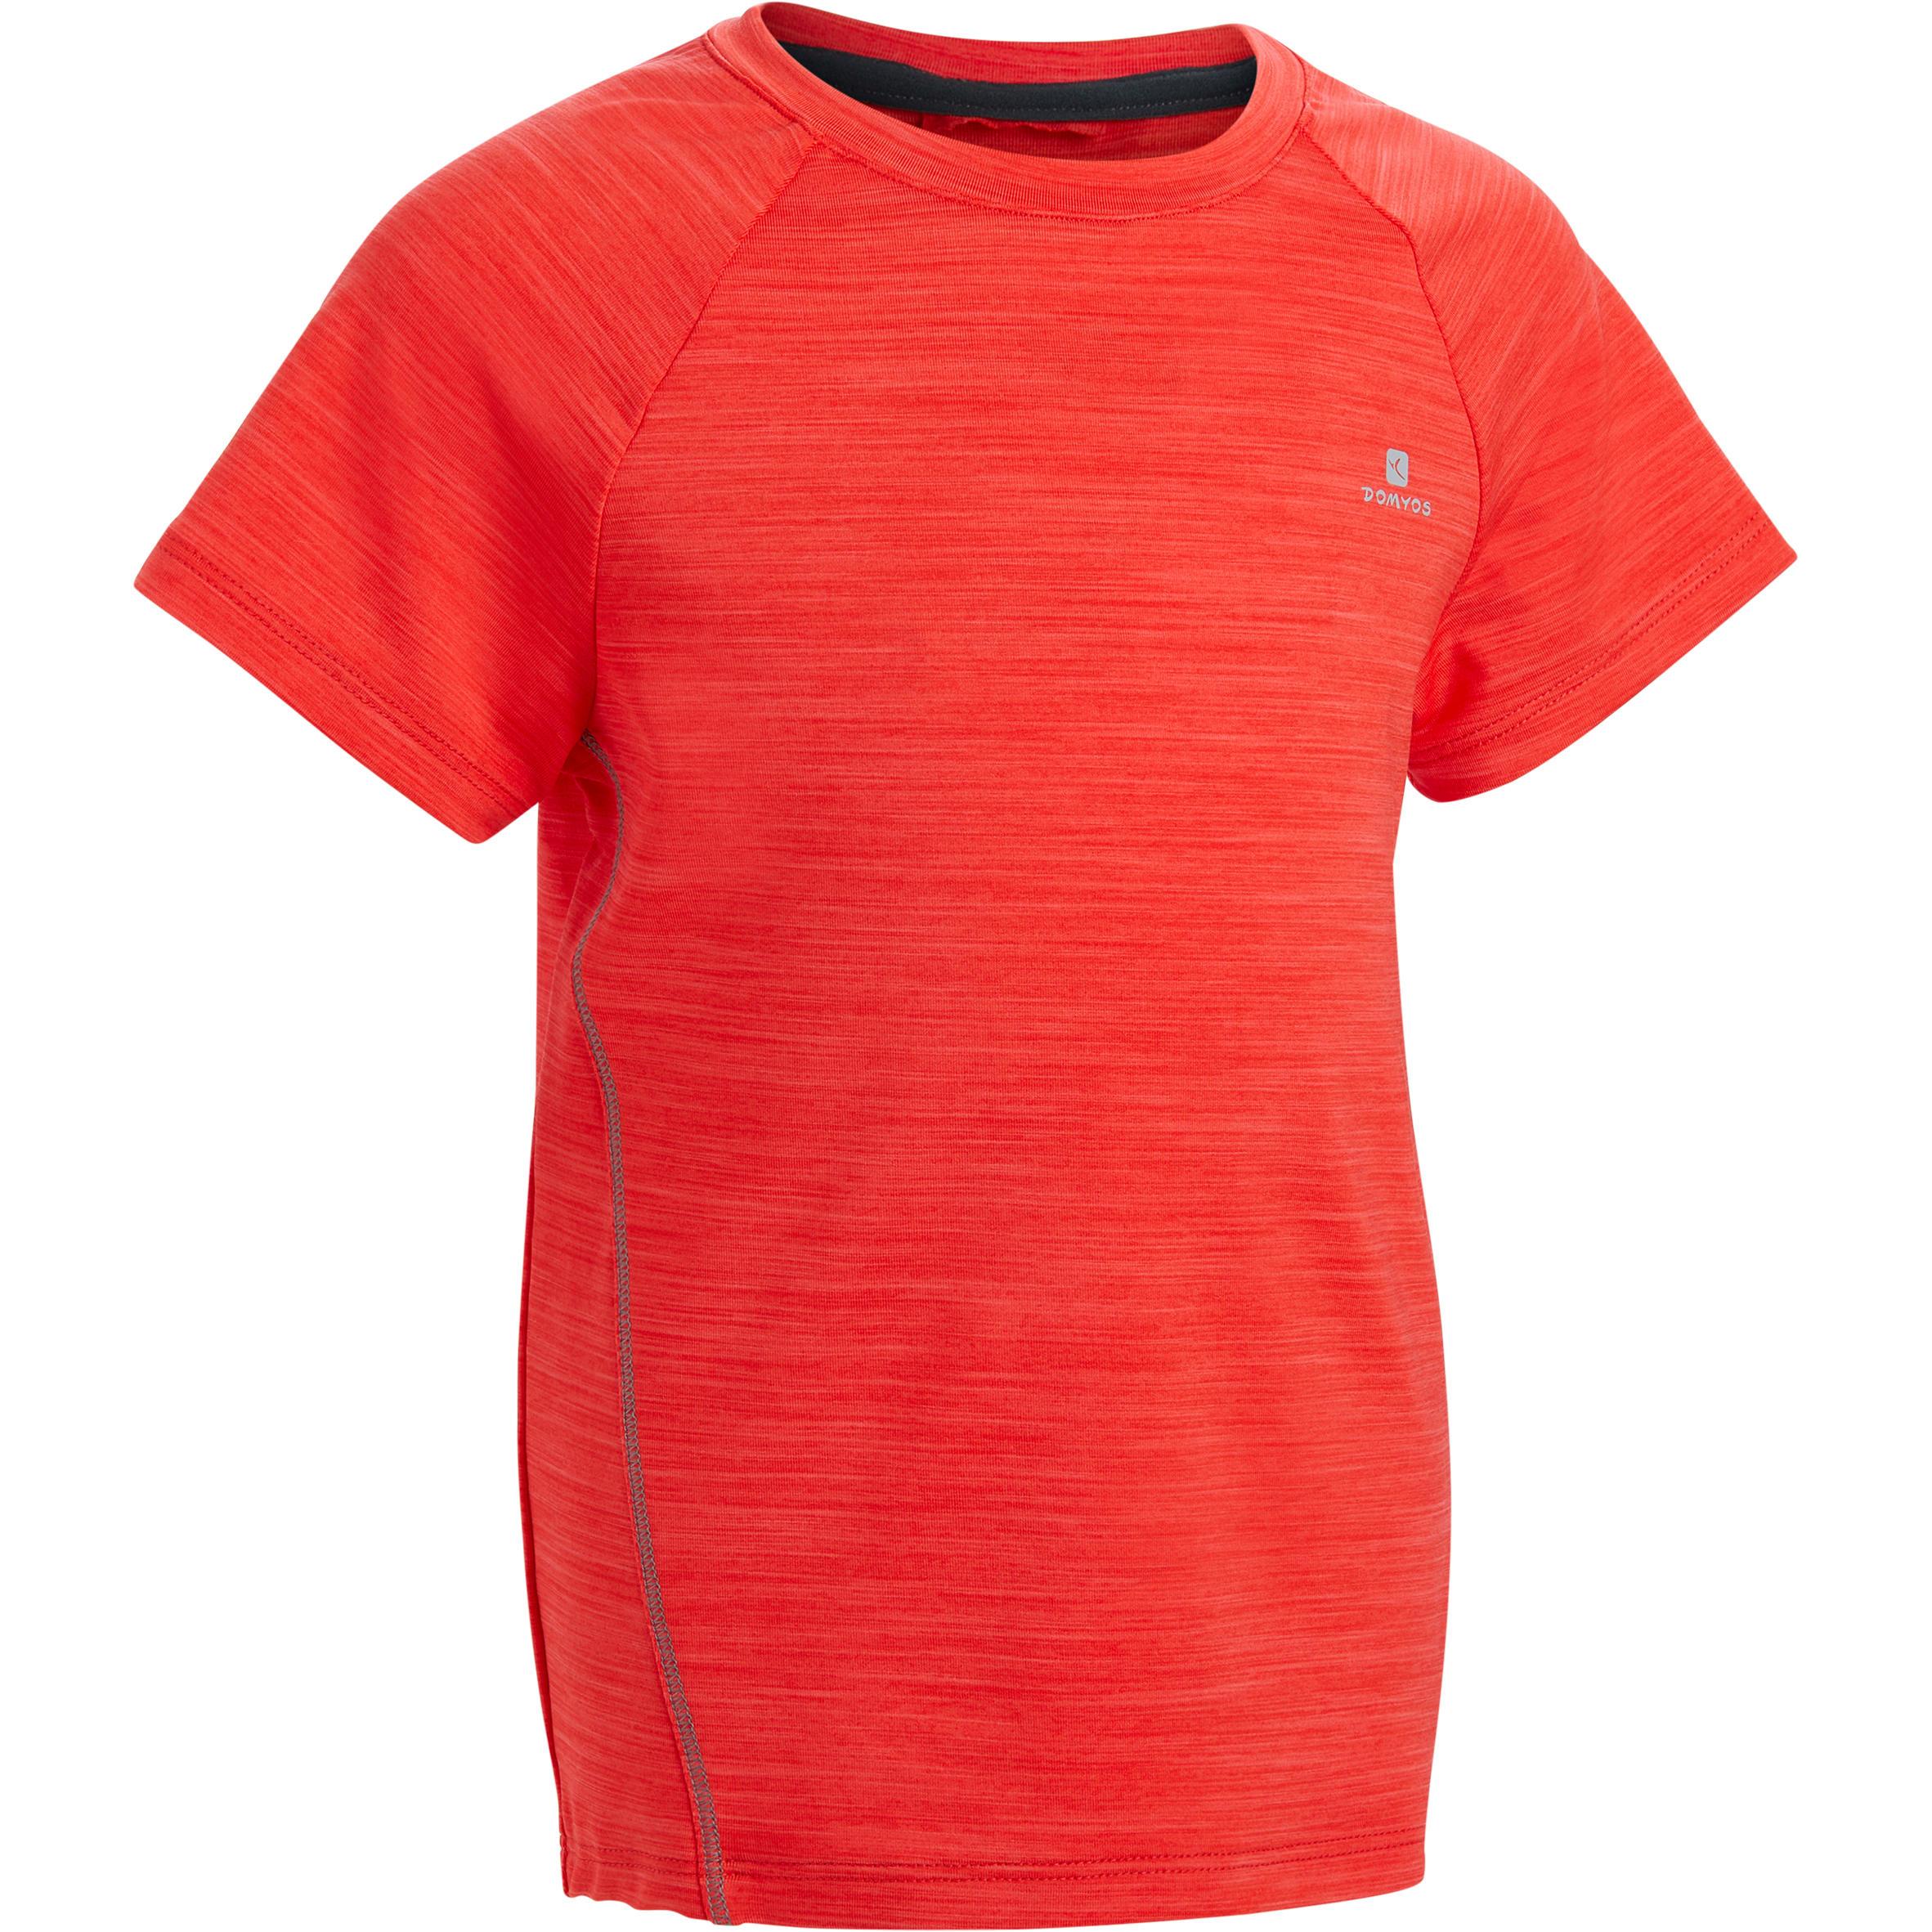 Tee-shirt 560 manches courtes gym garçon rouge